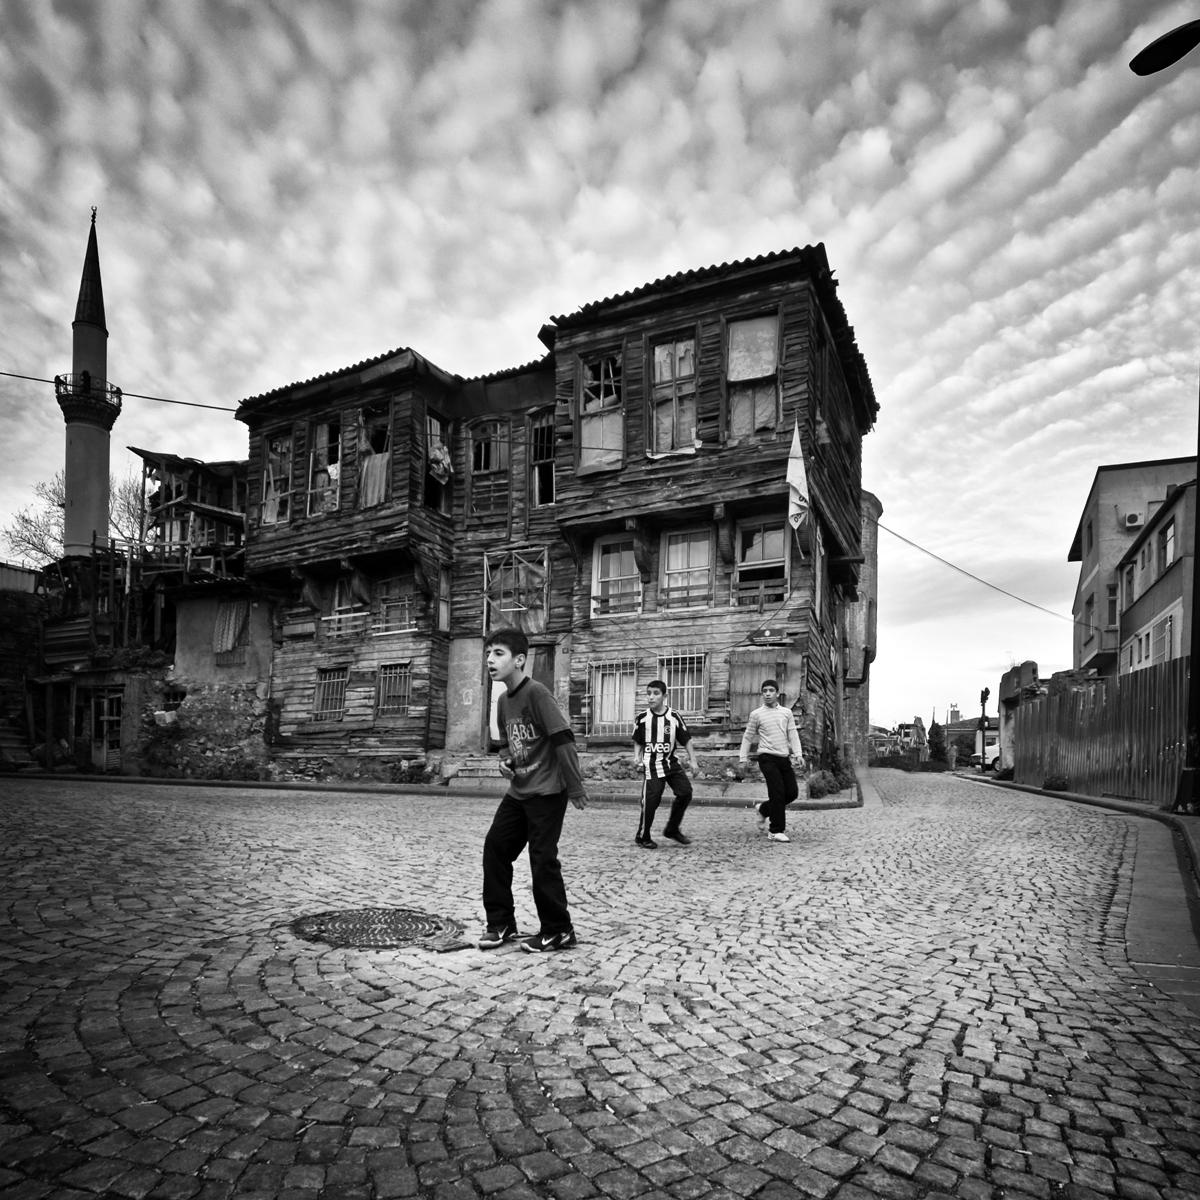 Dedeoglu_Mustafa_3